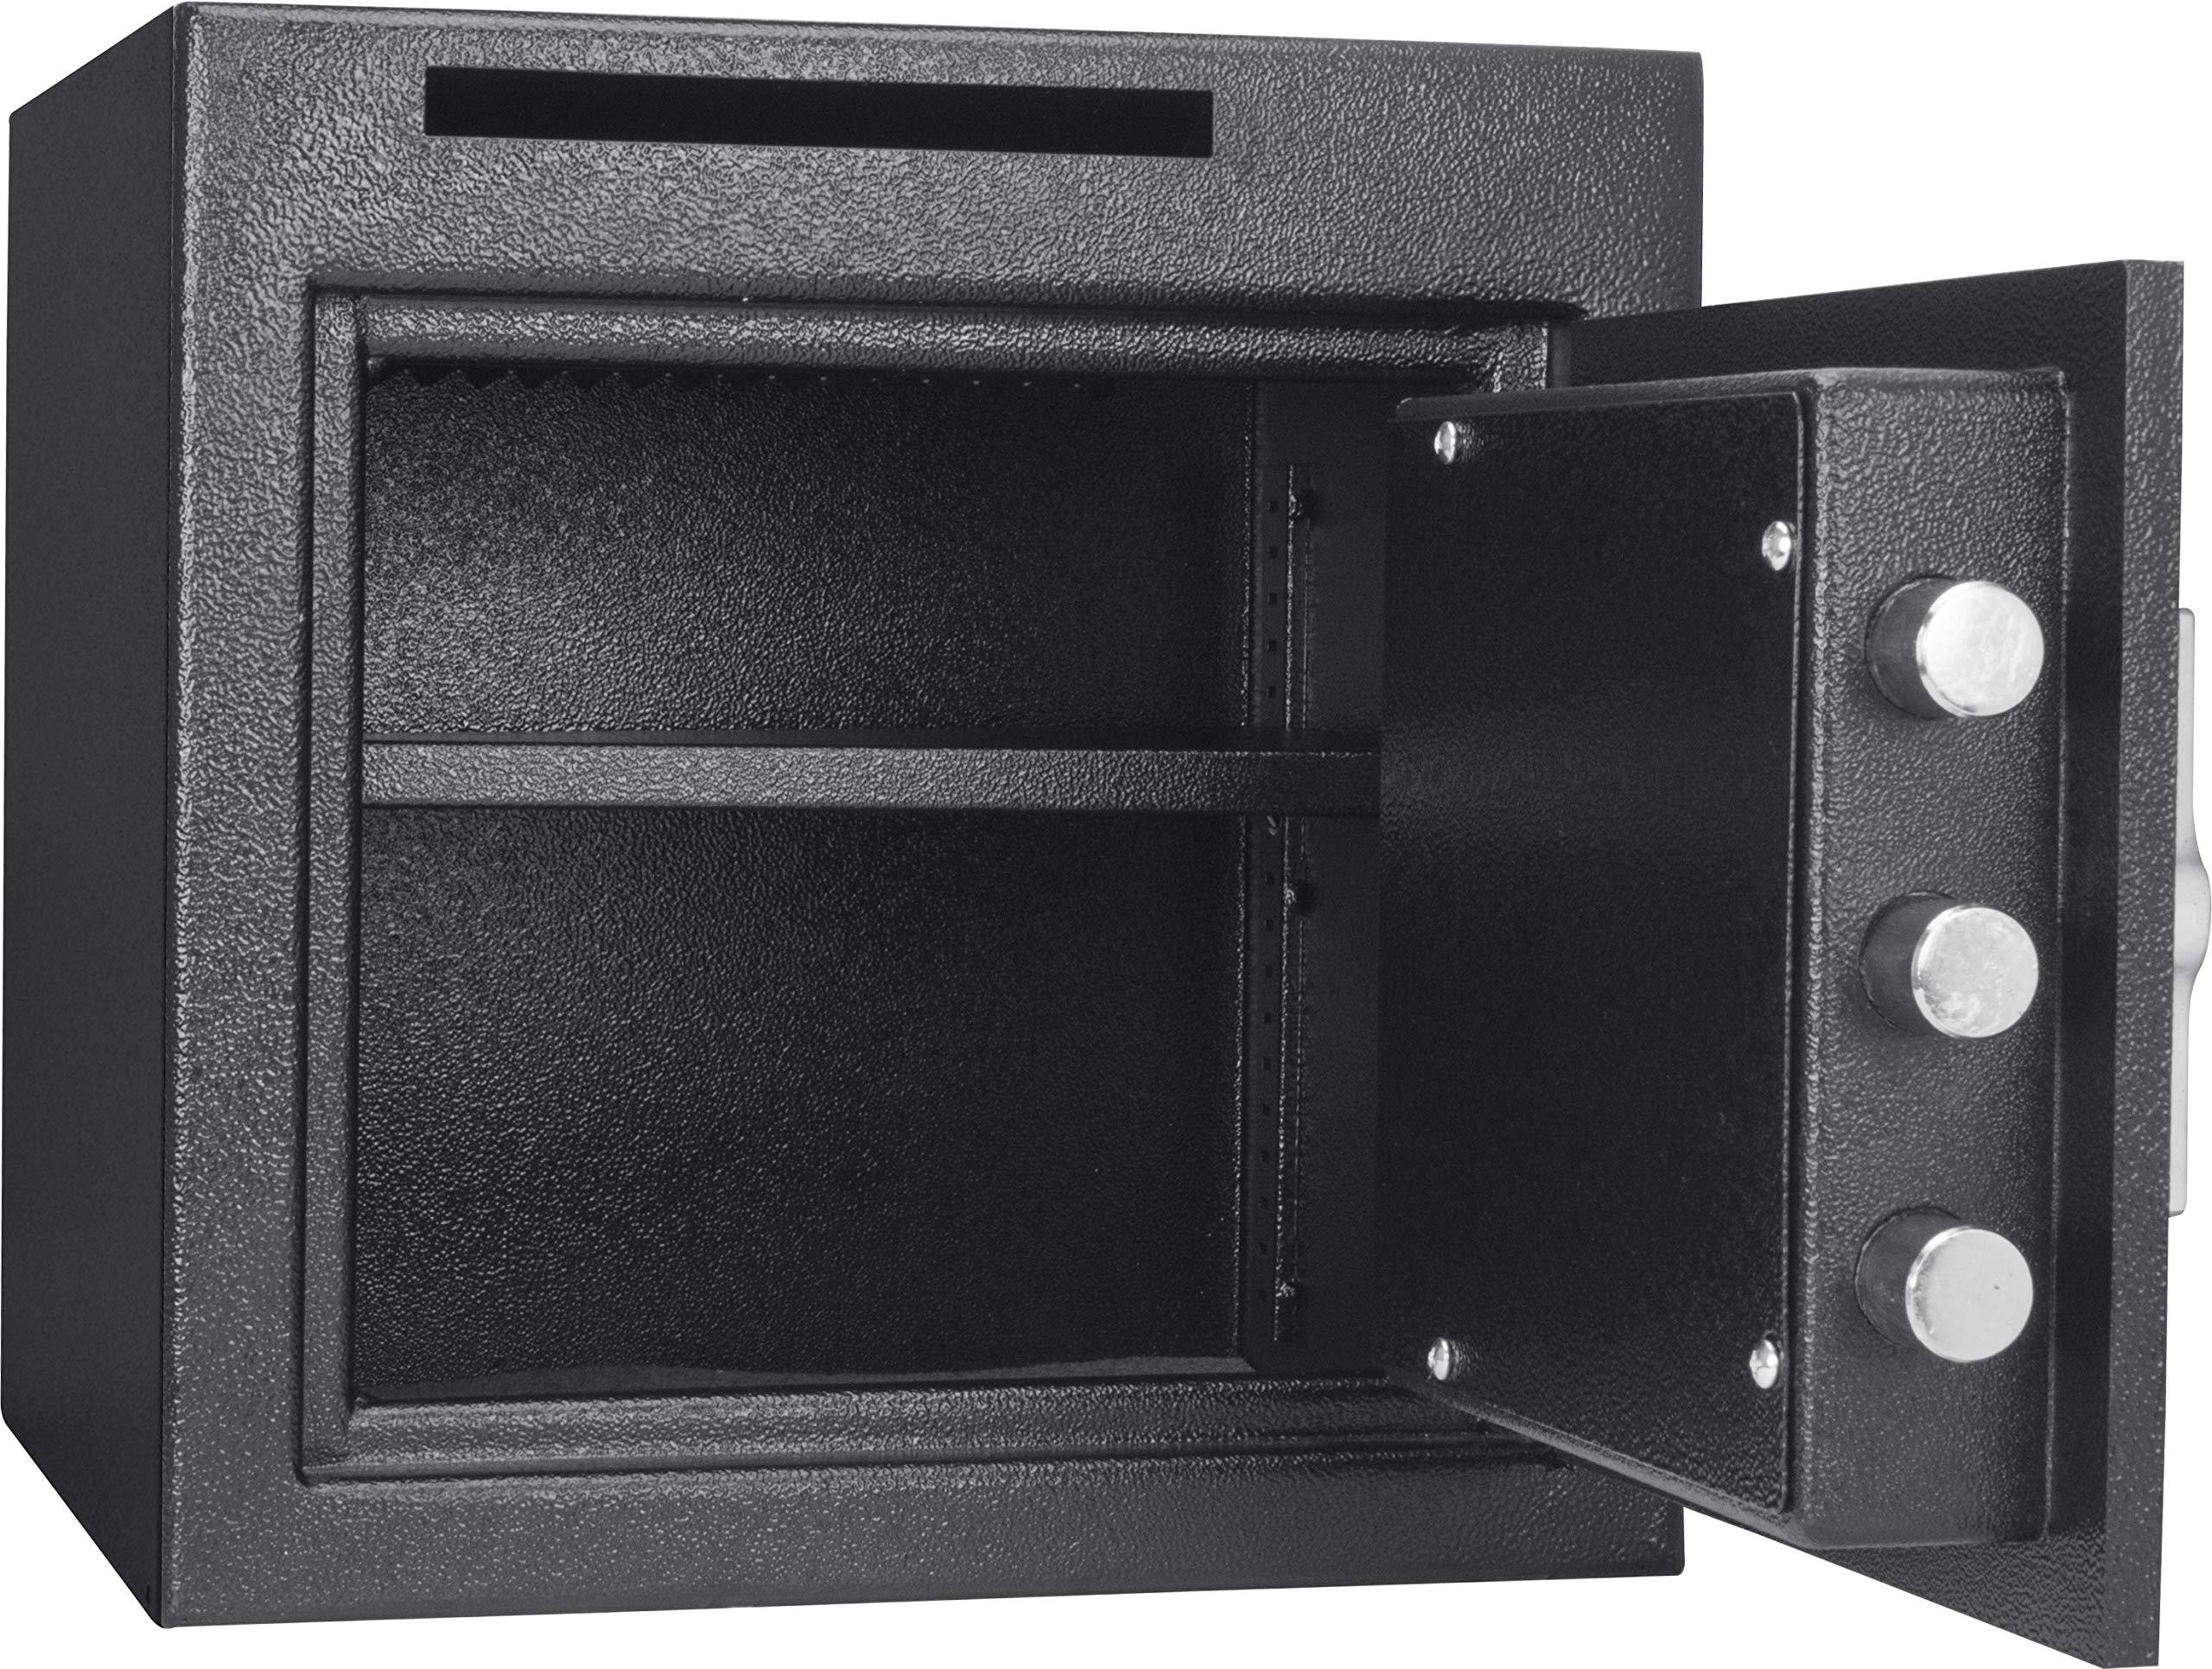 Winbest Steel Digital Keypad Cash Drop Front Loaded Depository Safe Drop Box Storage 1.12 Cubic ft by winbest (Image #2)